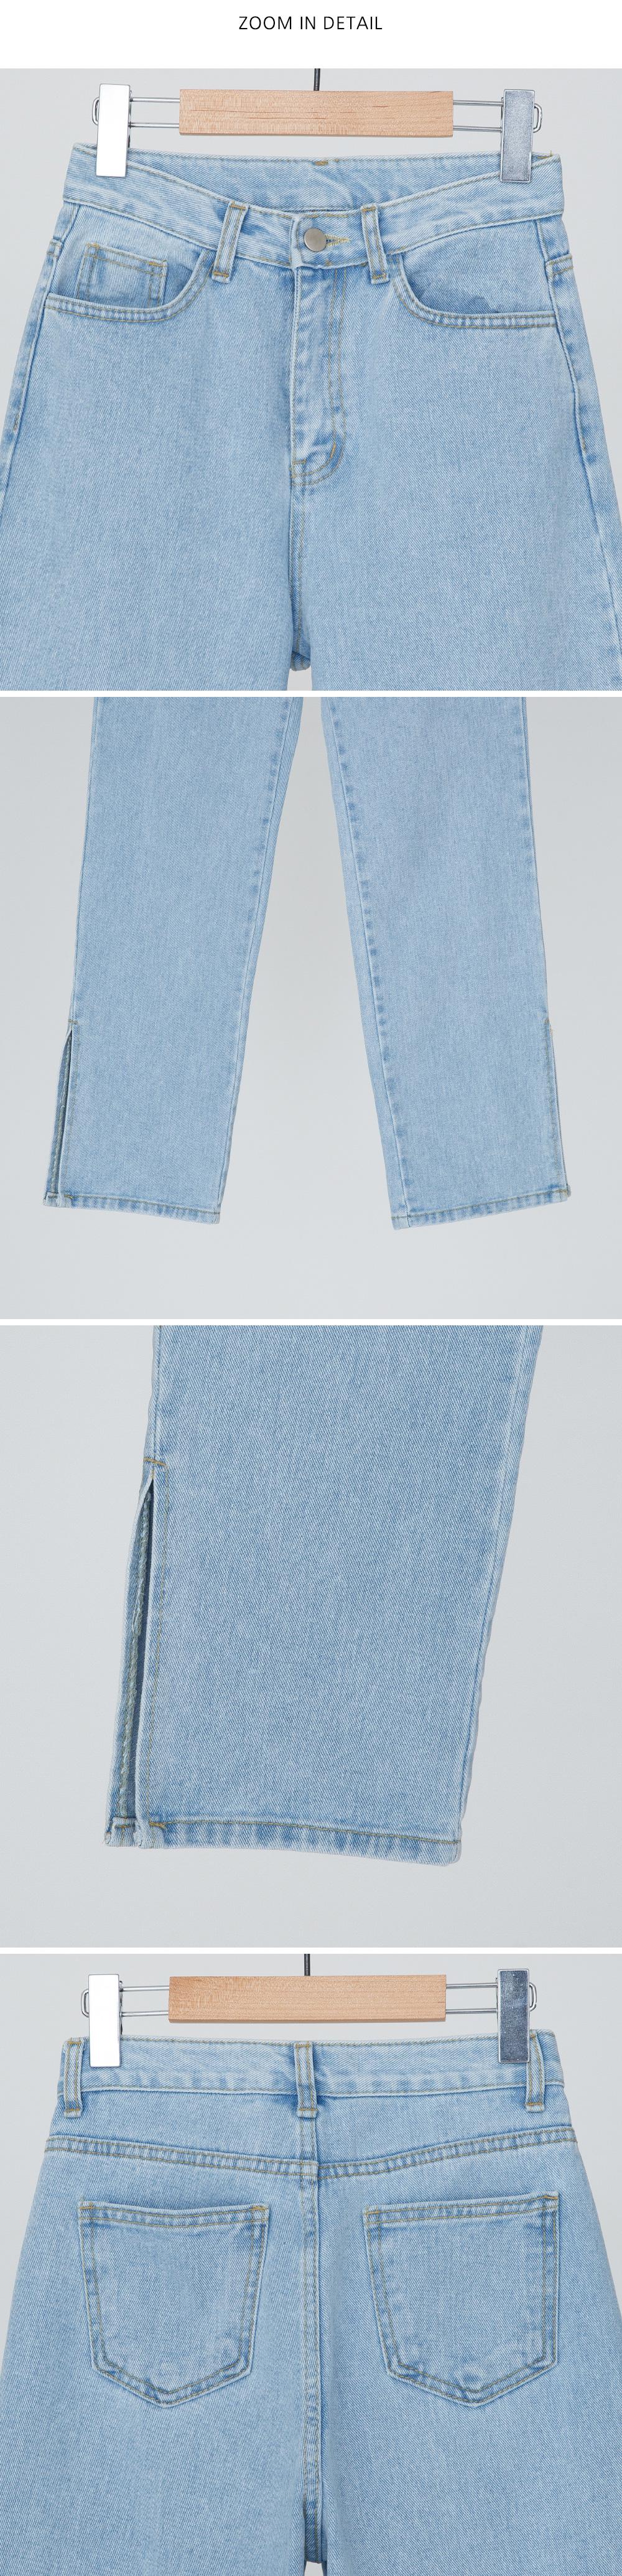 High West Side Open Jeans